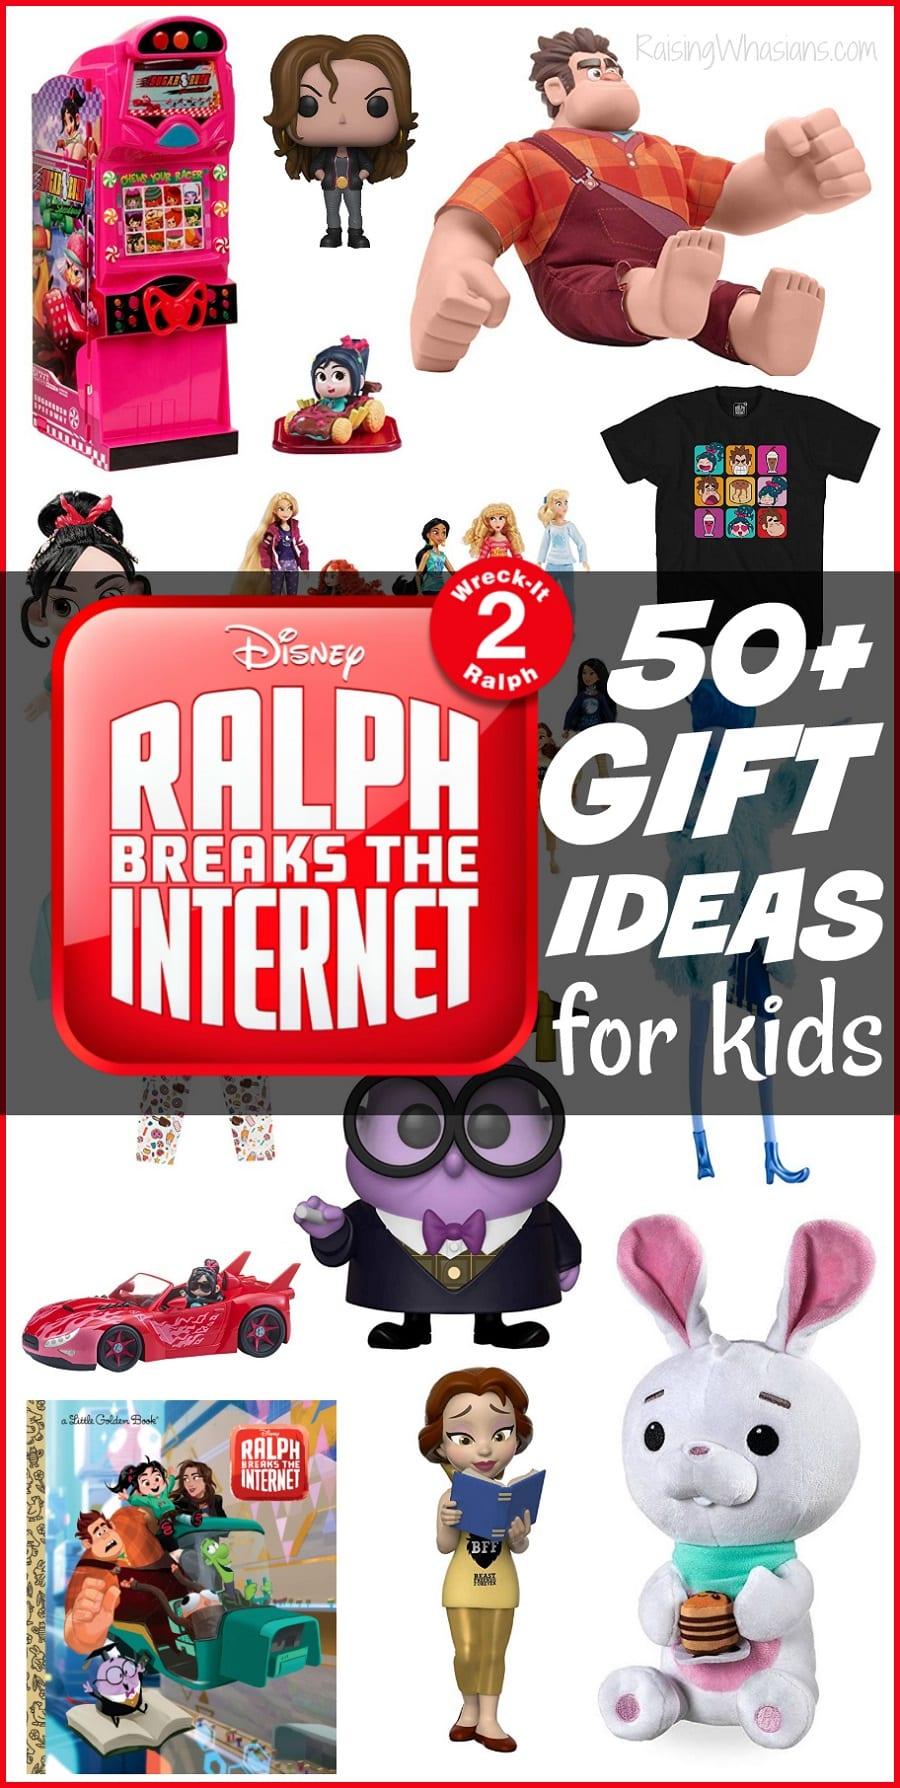 Ralph breaks the internet gift ideas